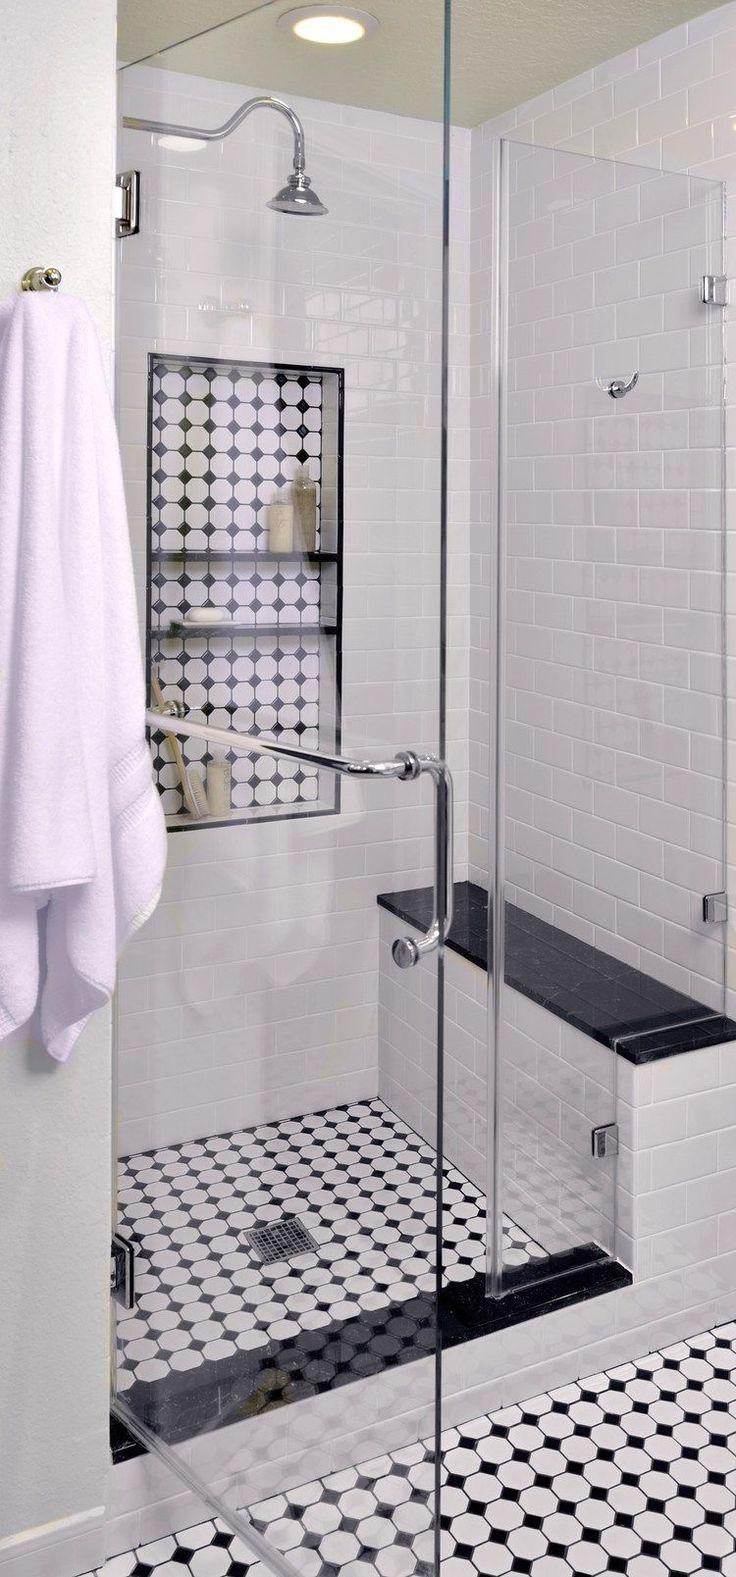 Mosaic Bathroom Designs Home Decoration Interior House Designer